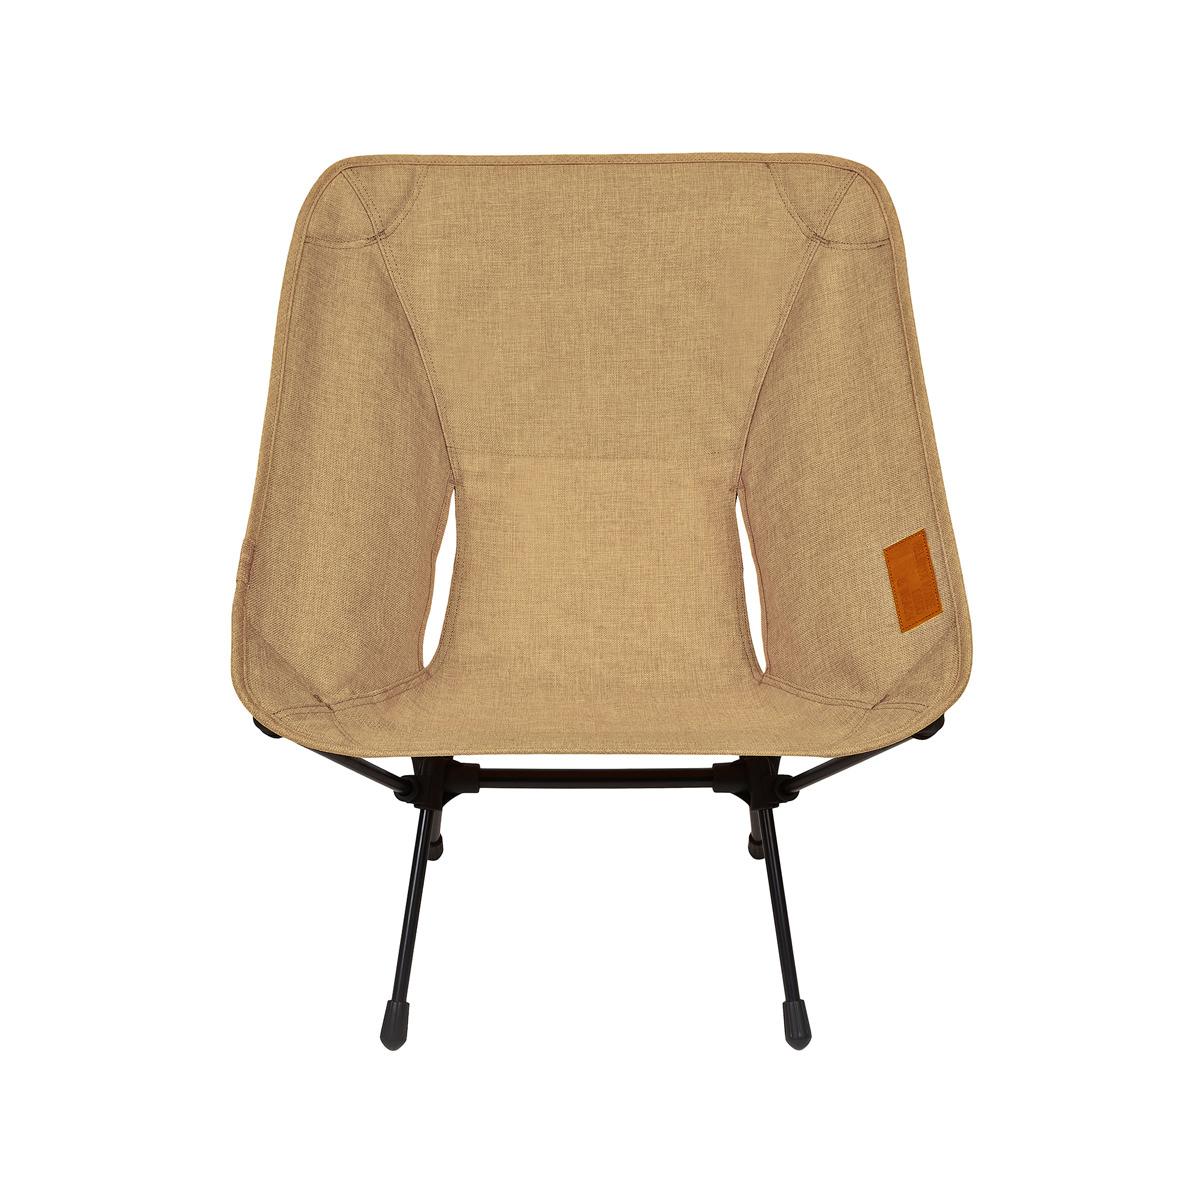 Helinox HOME コンフォートチェア ヘリノックス アウトドア 椅子 室内